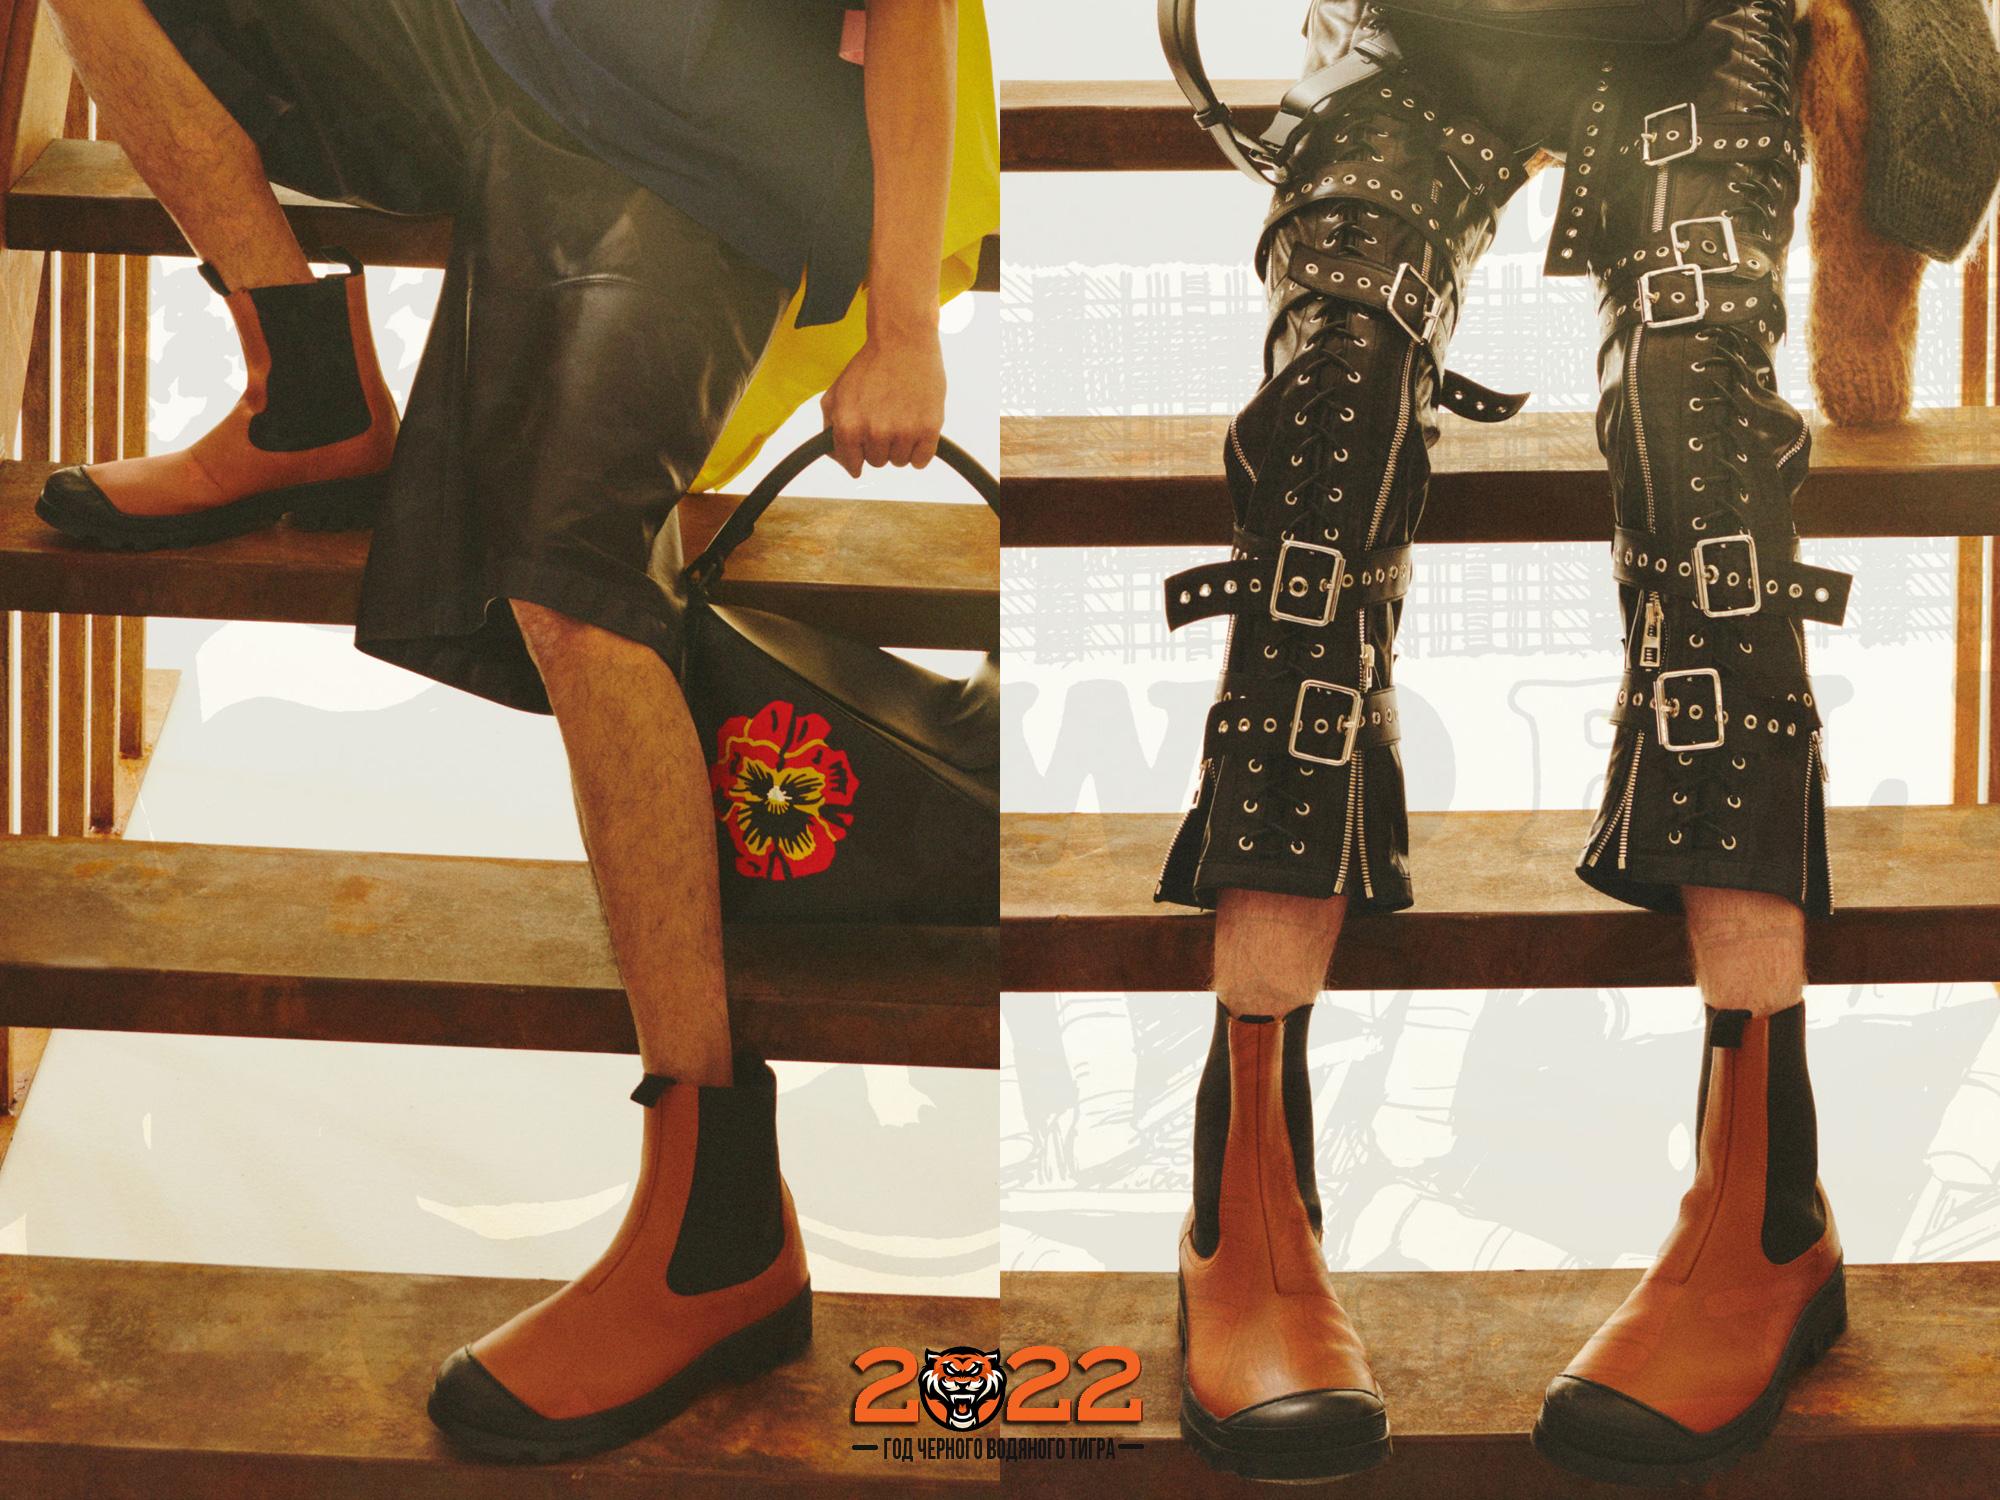 Челси от Loewe - модная мужская обувь на 2022 год